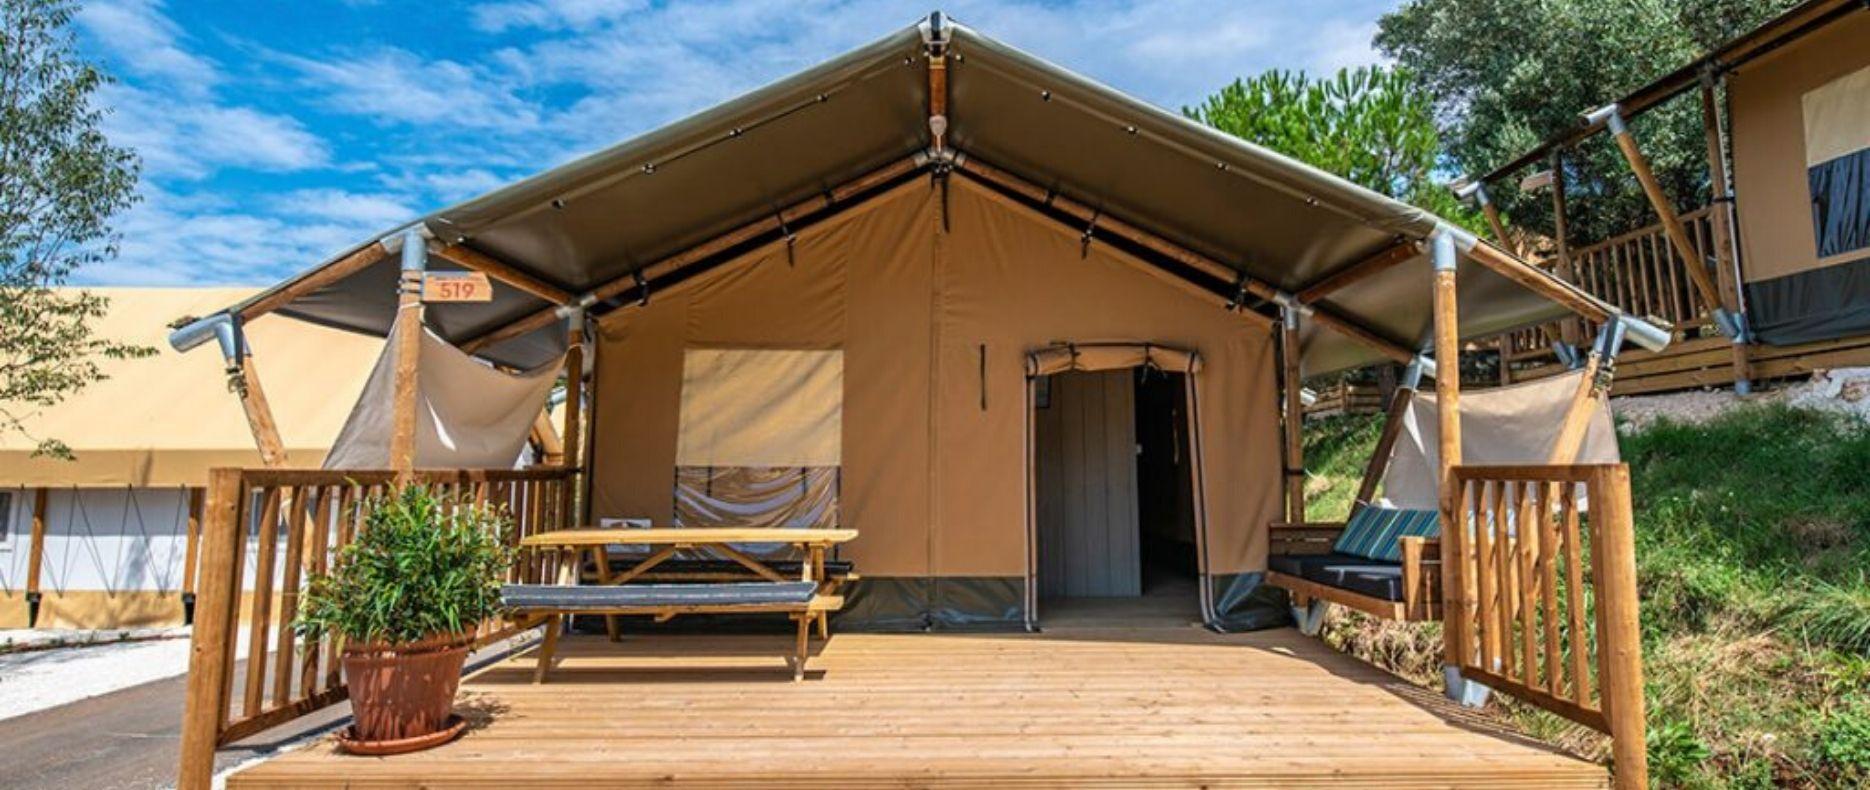 Tente Safari Wood Headerau Pouldu